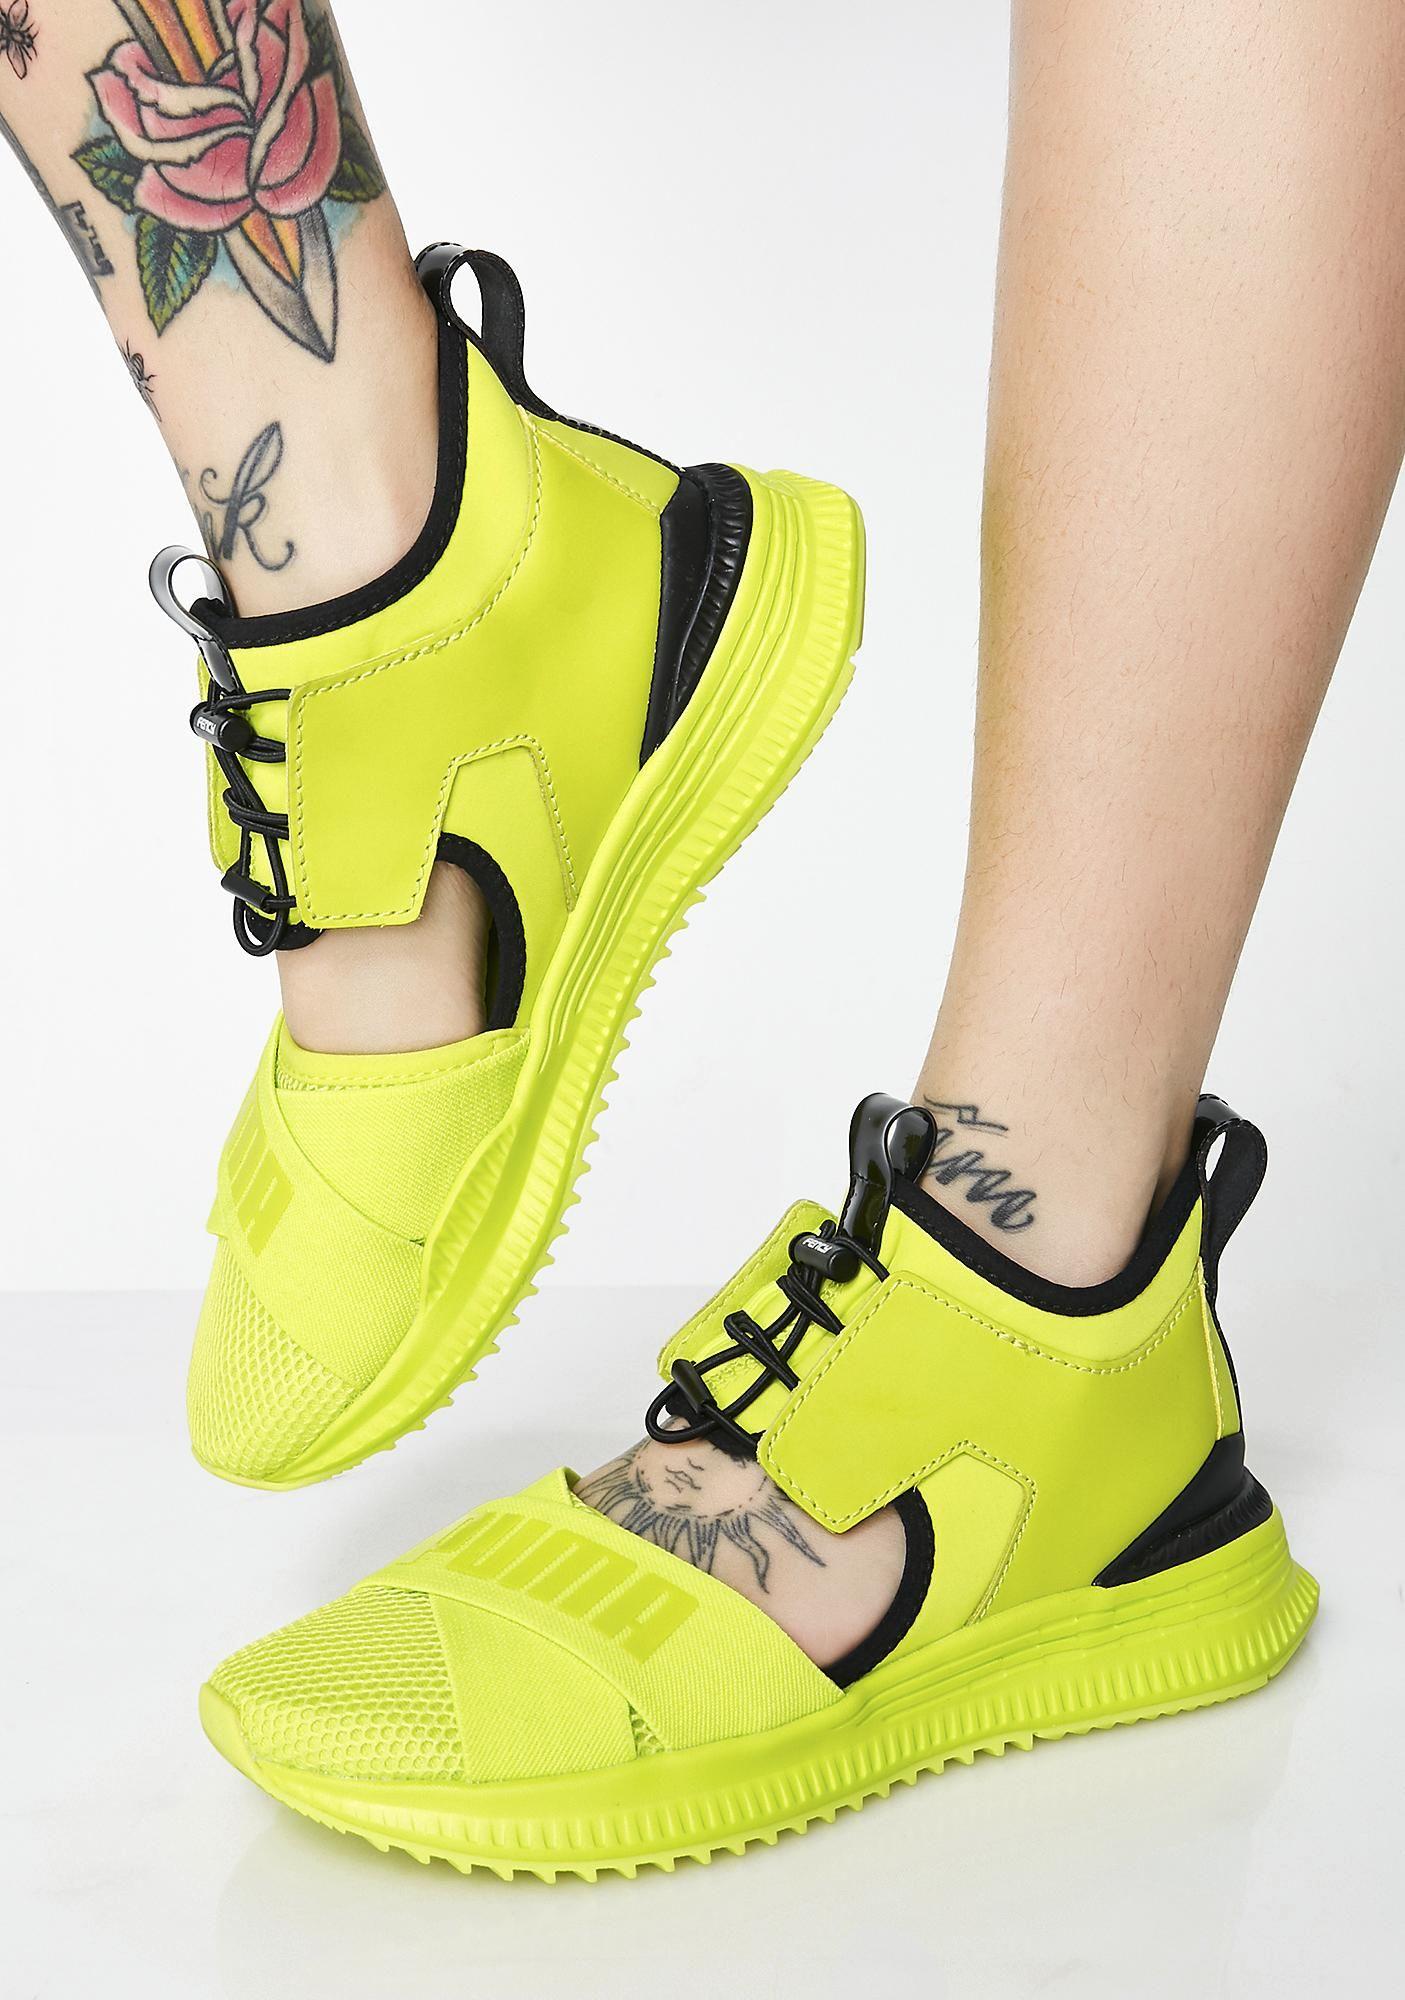 Fenty Puma By Rihanna Avid Sneakers Men Fenty Puma By